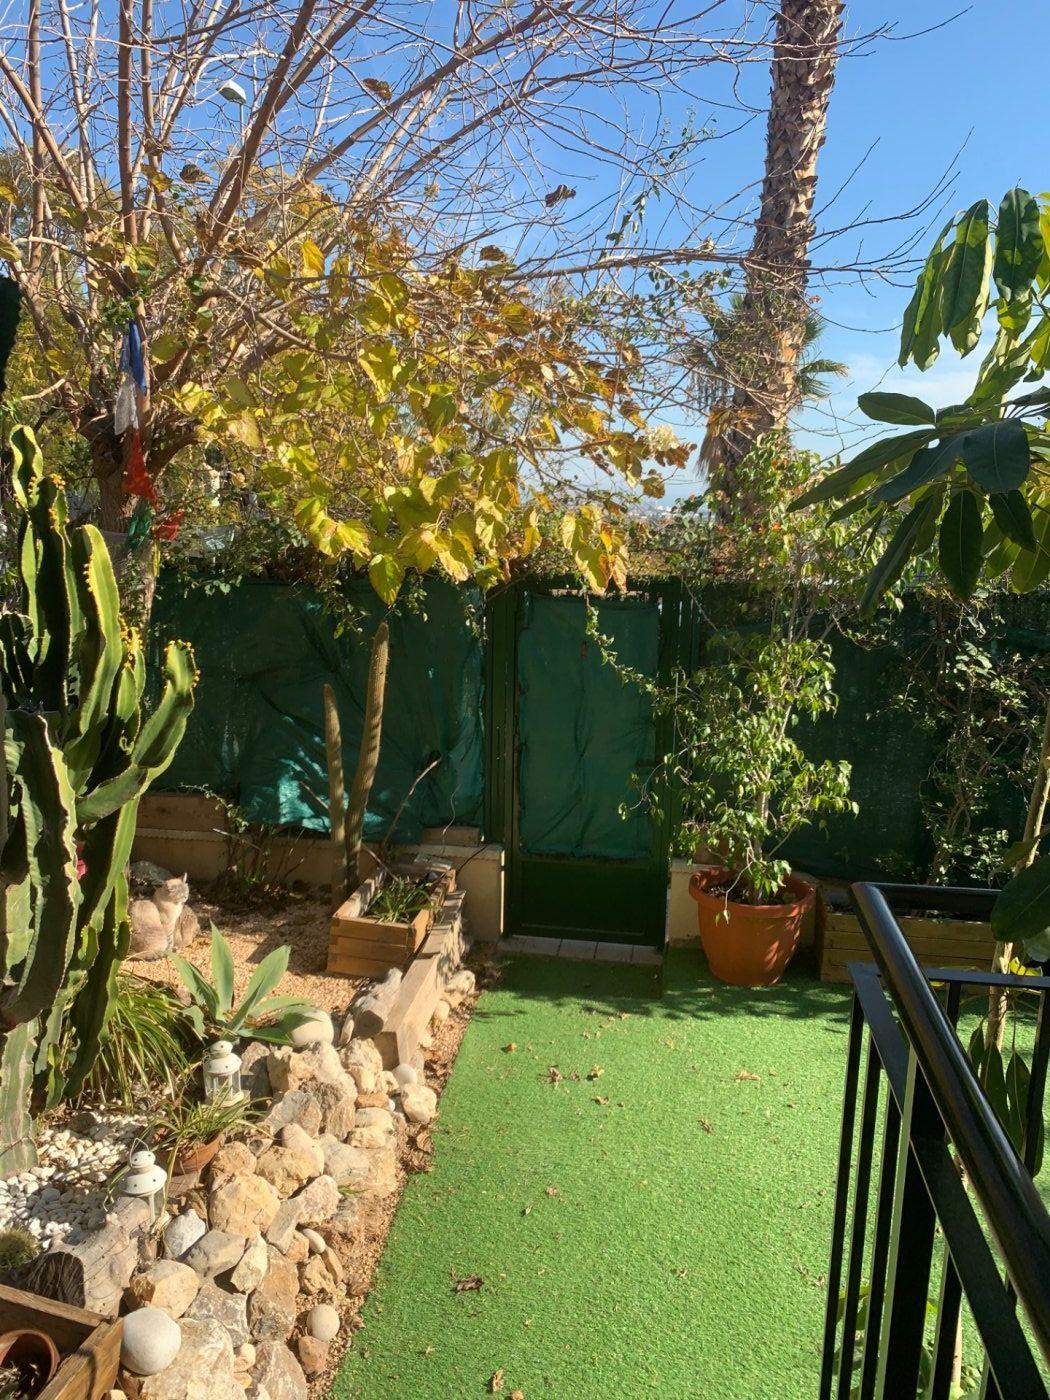 Planta baja adosada con jardin en bonalva - imagenInmueble1